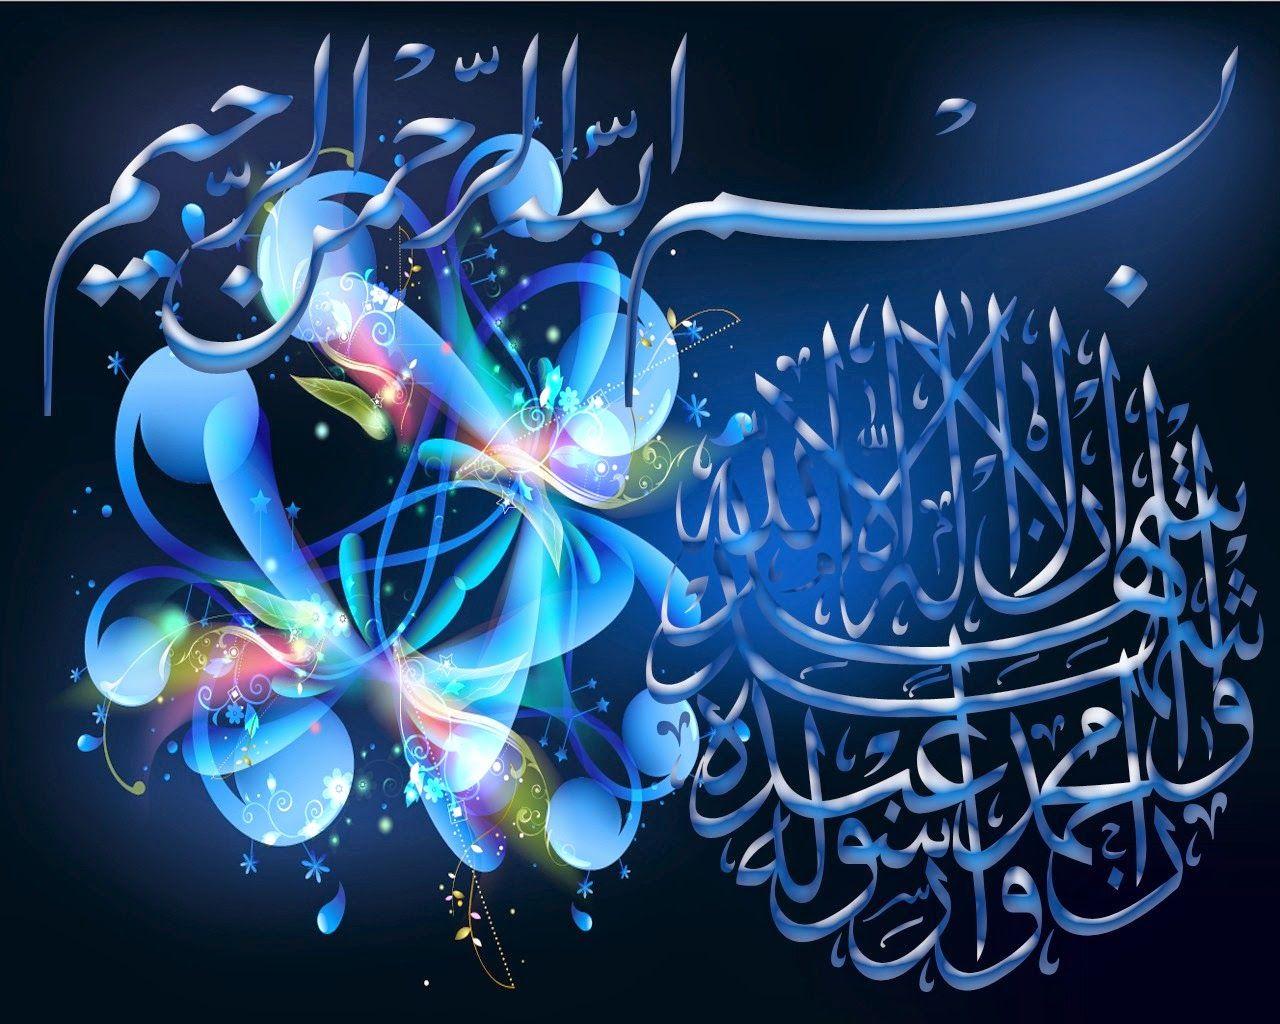 kaligrafi indah utk mu wahai nabi ku Kaligrafi arab